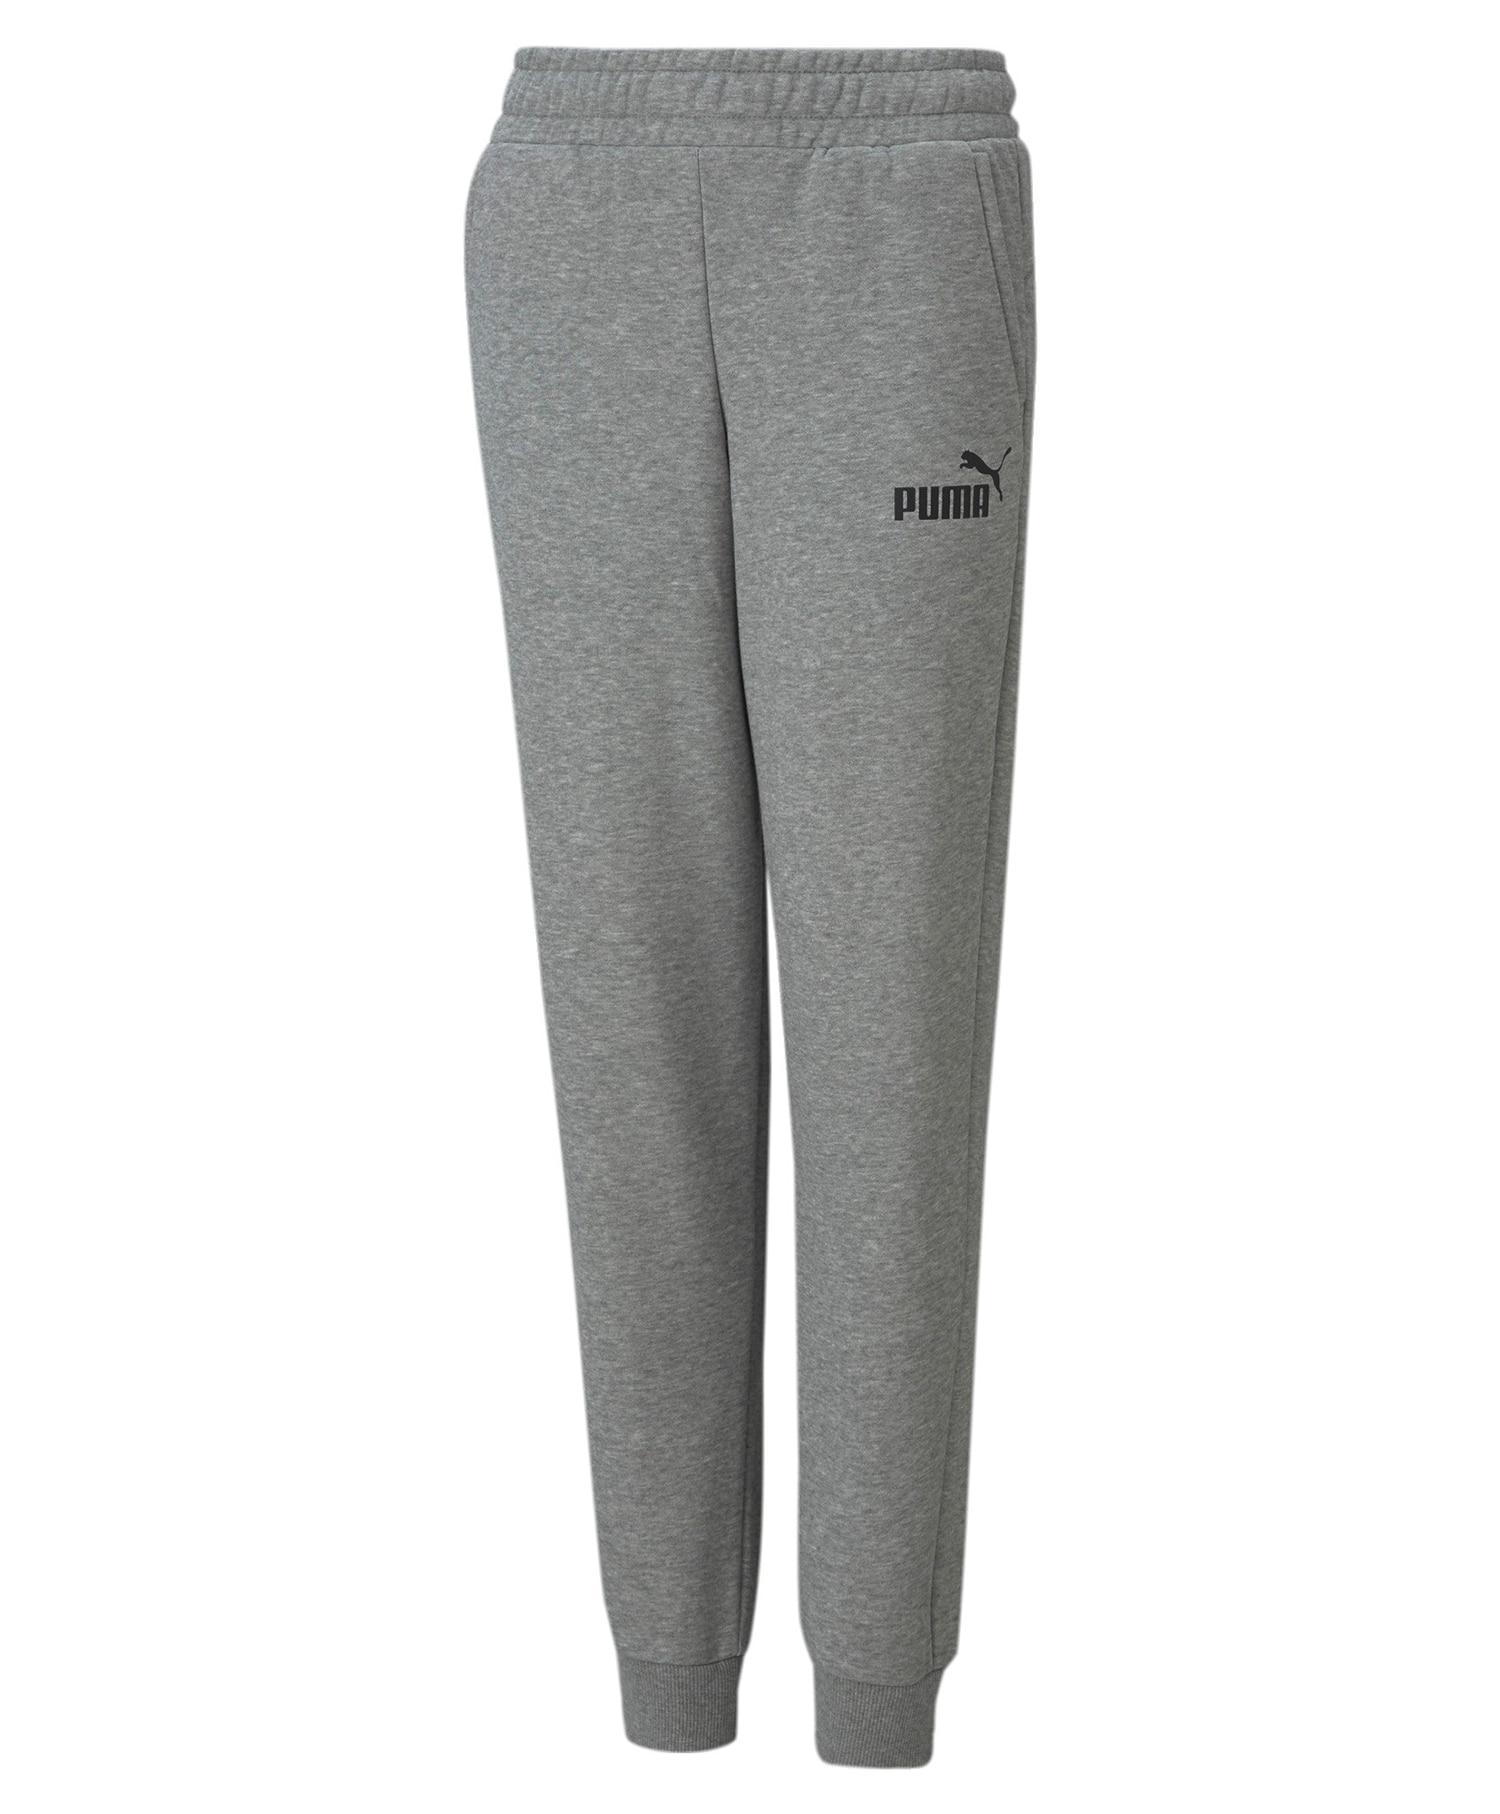 Puma small logo pants